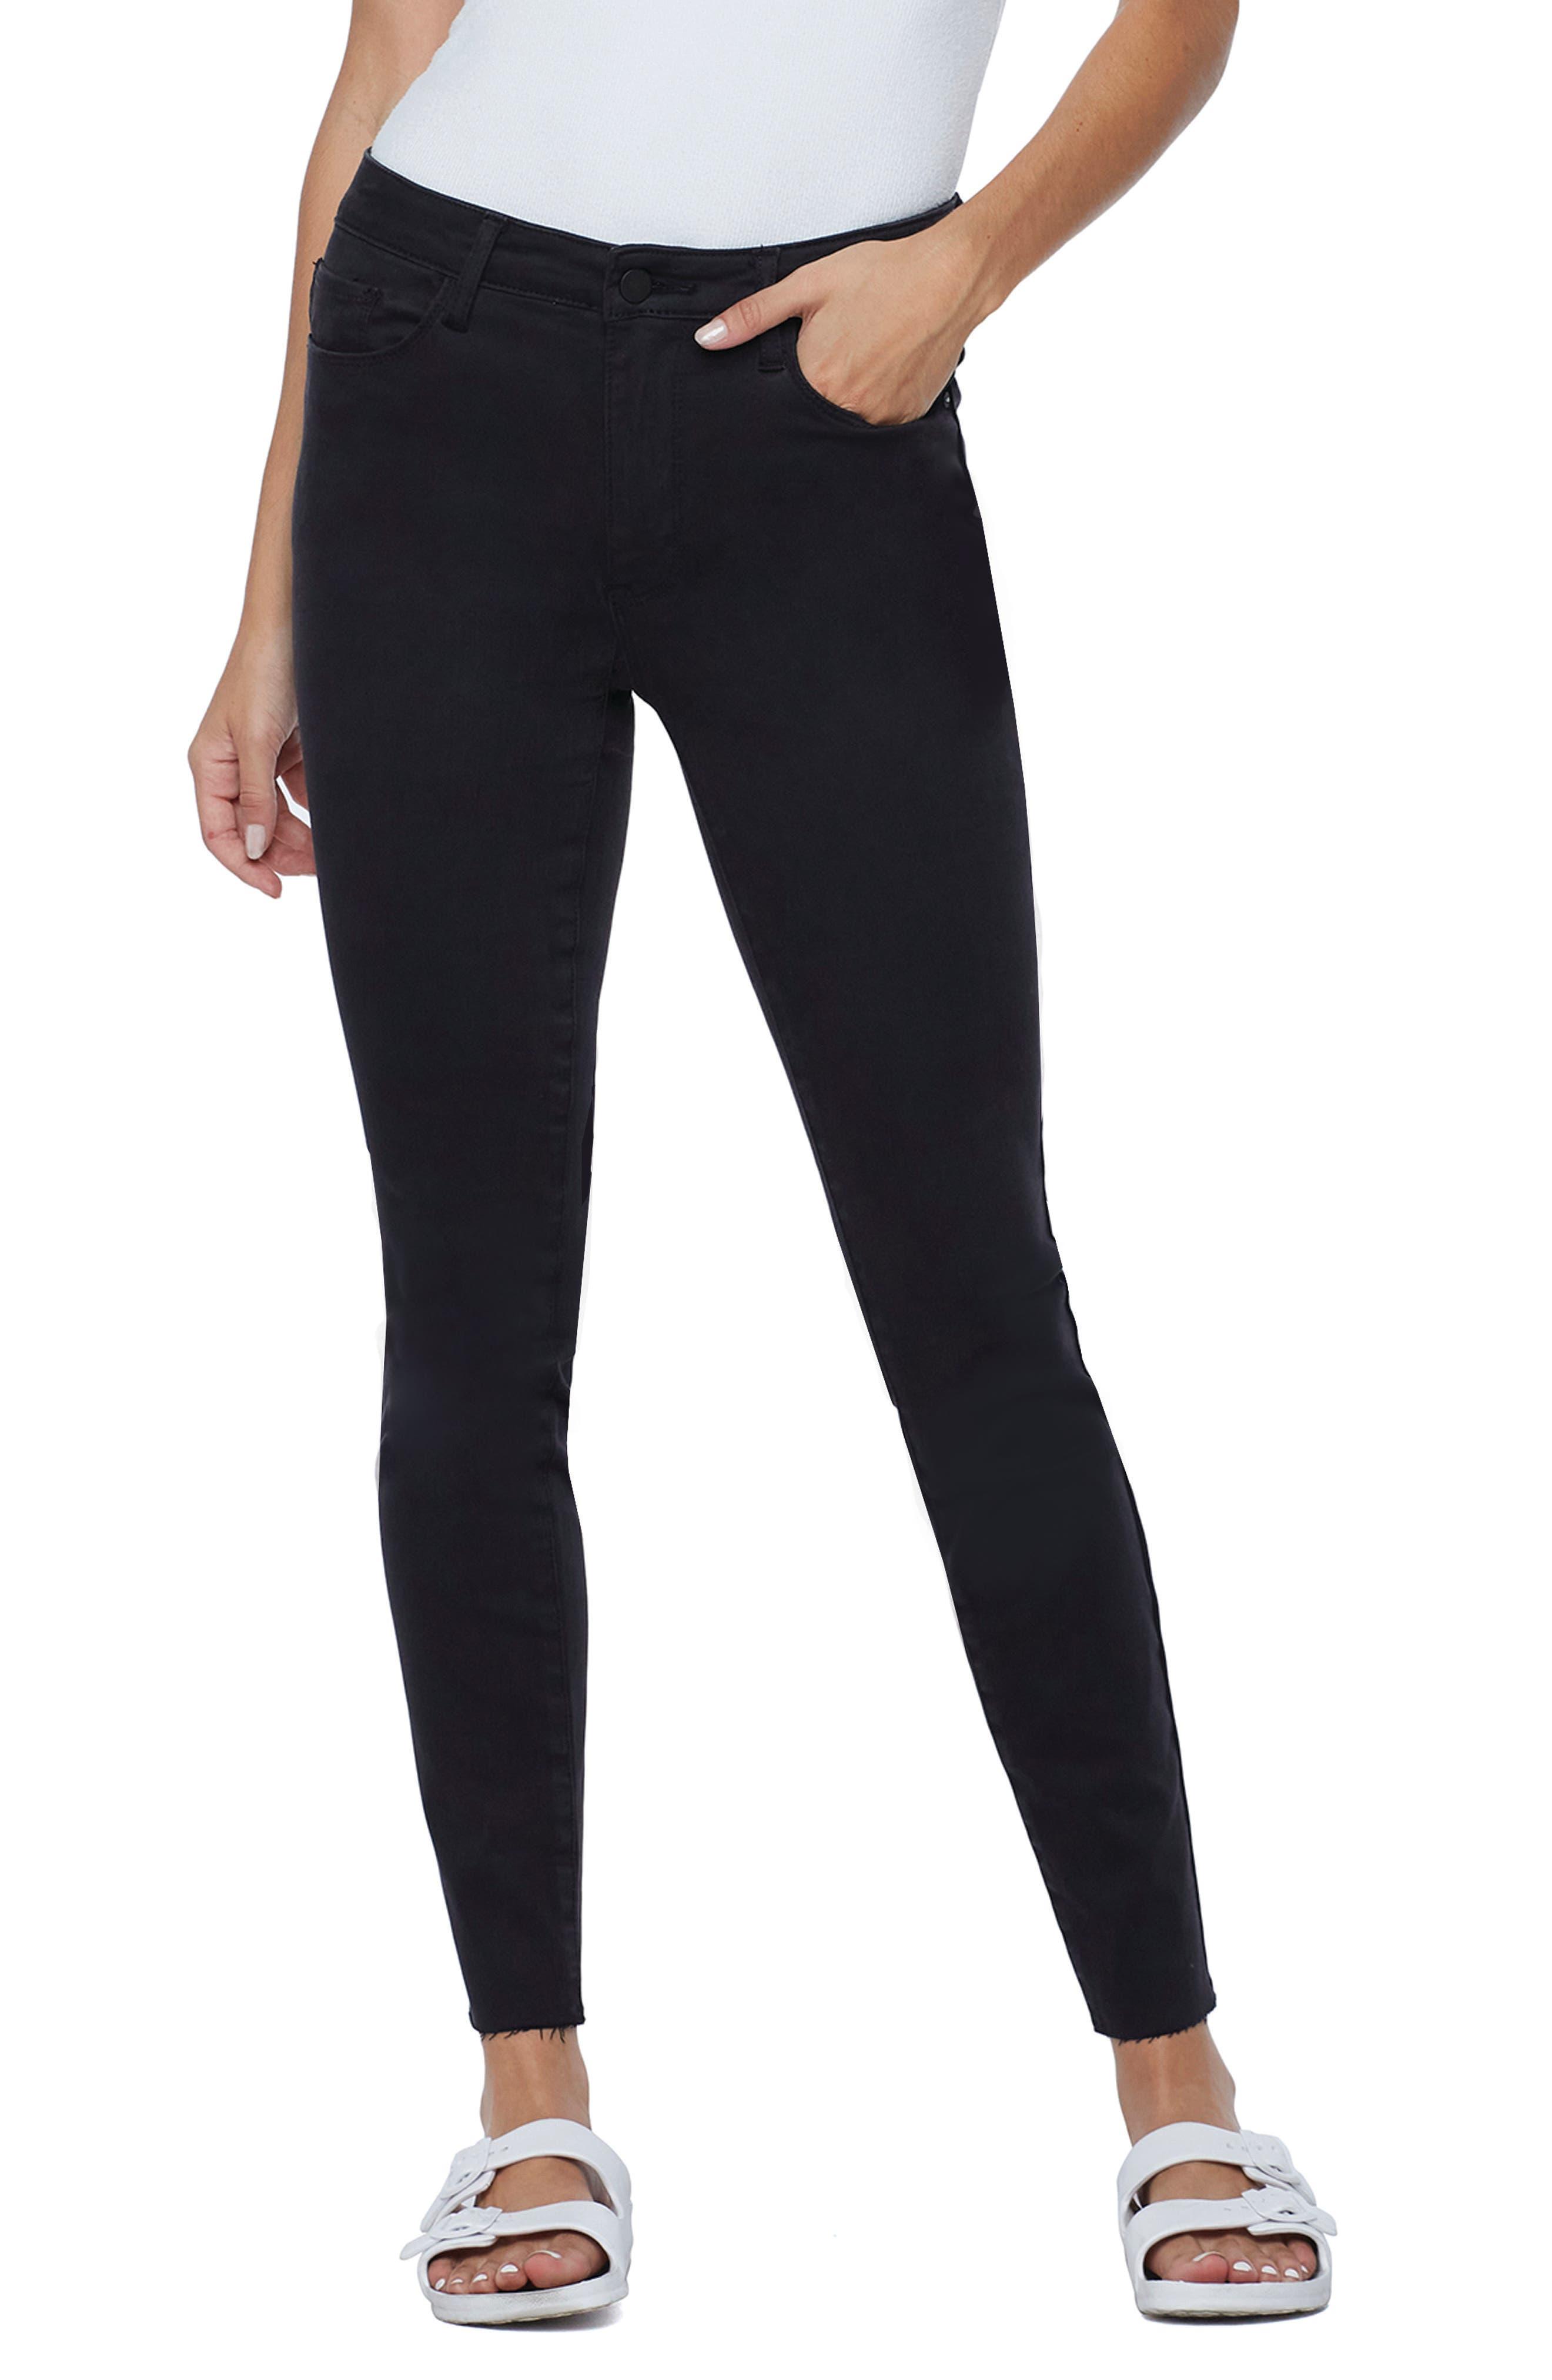 Brilliant High Waist Skinny Jeans